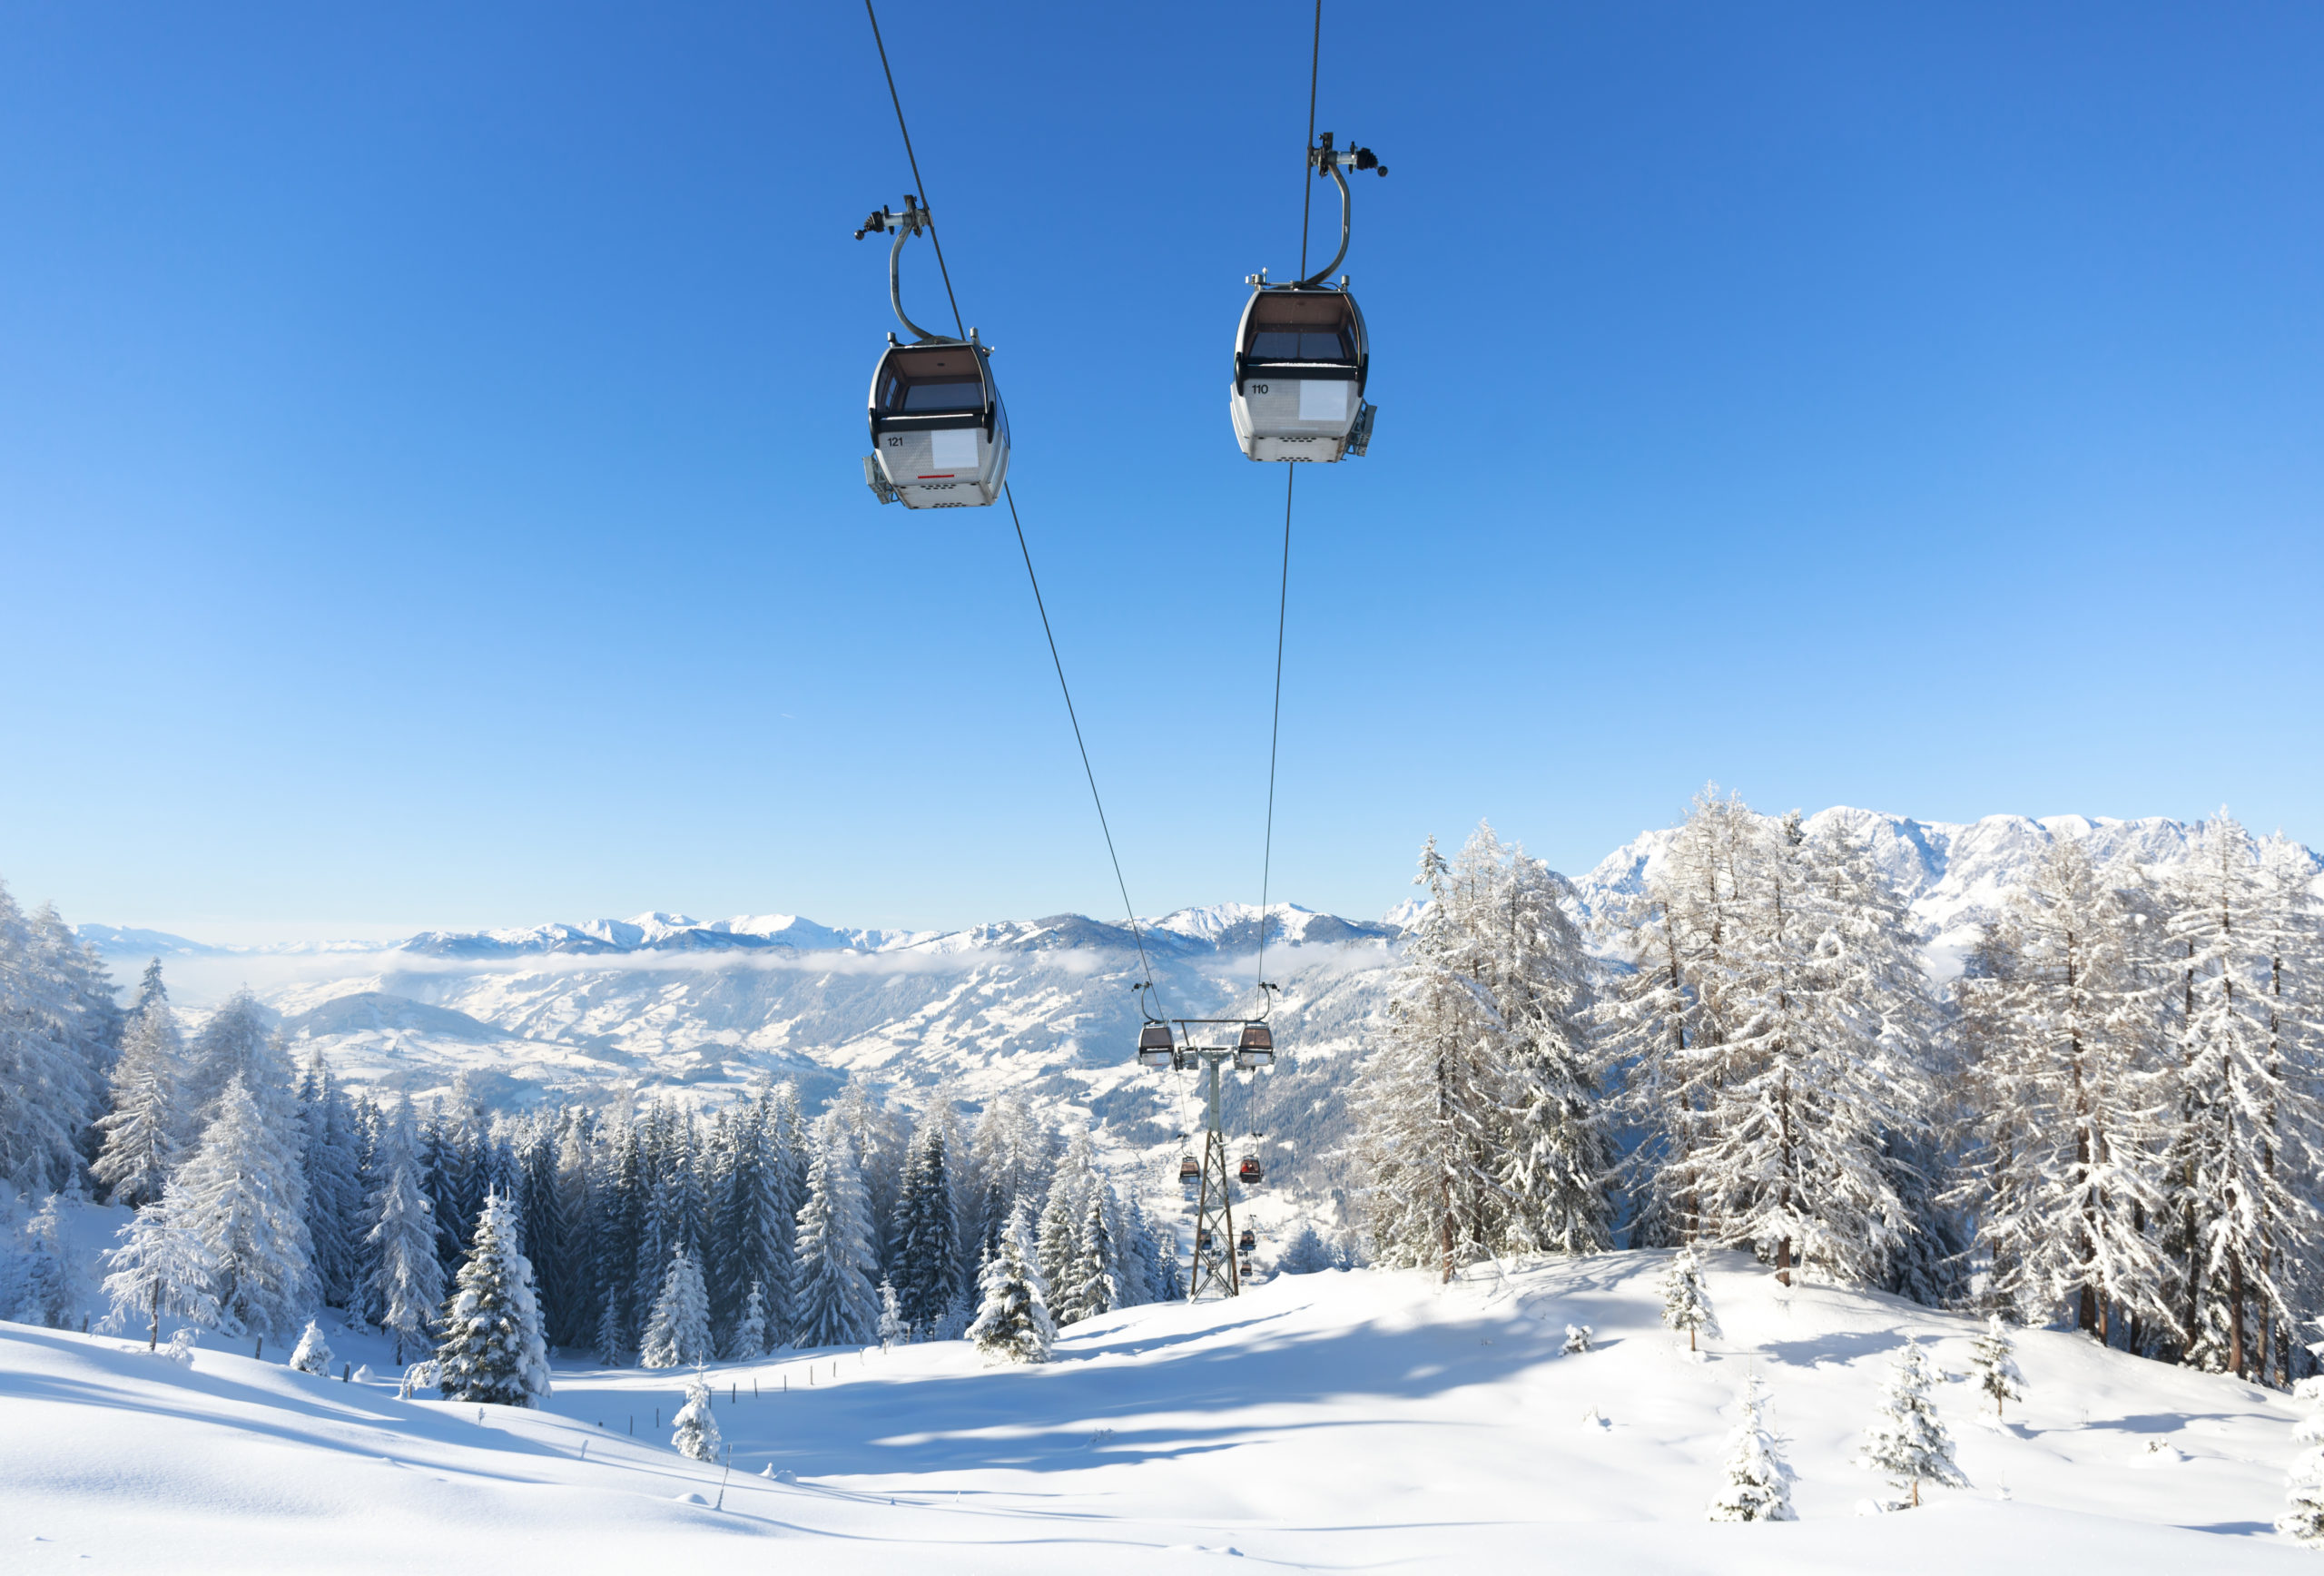 chair lift at ski resort in Austria